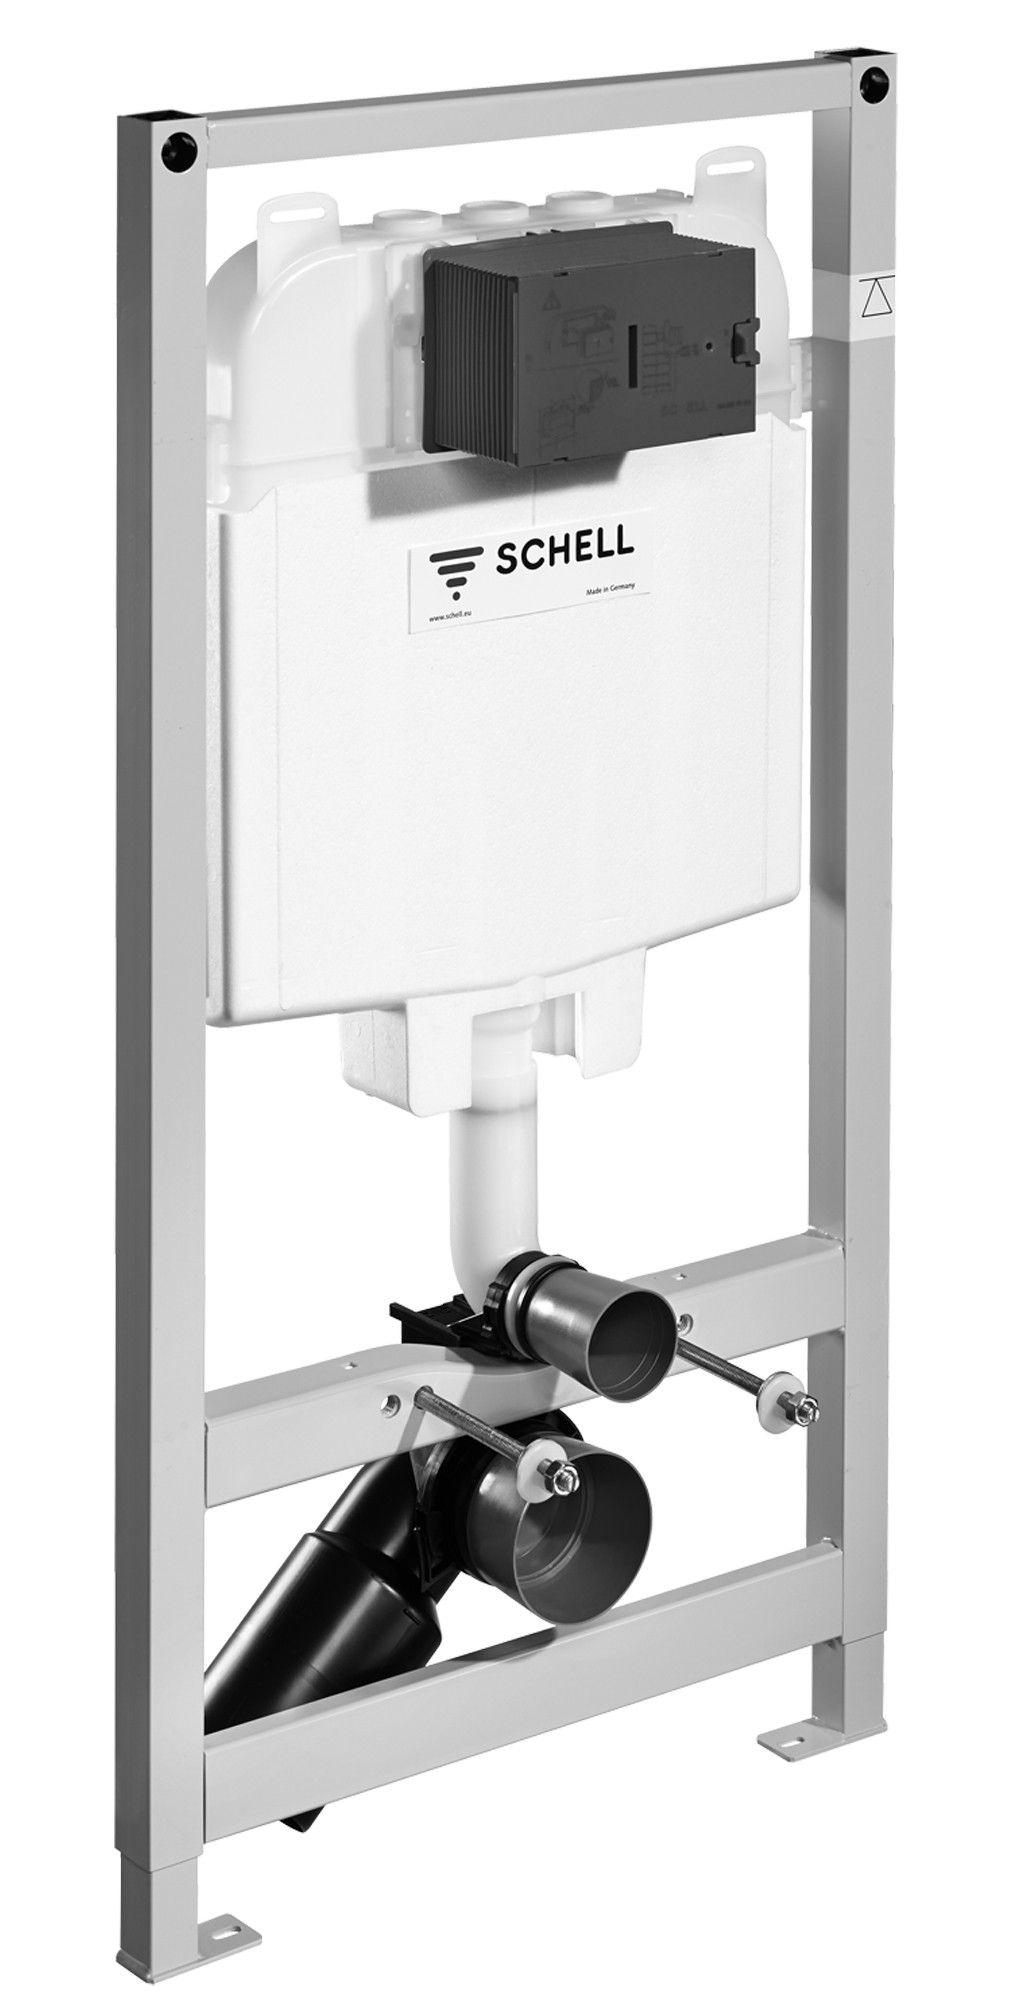 SCHELL WC mounting module MONTUS C 80